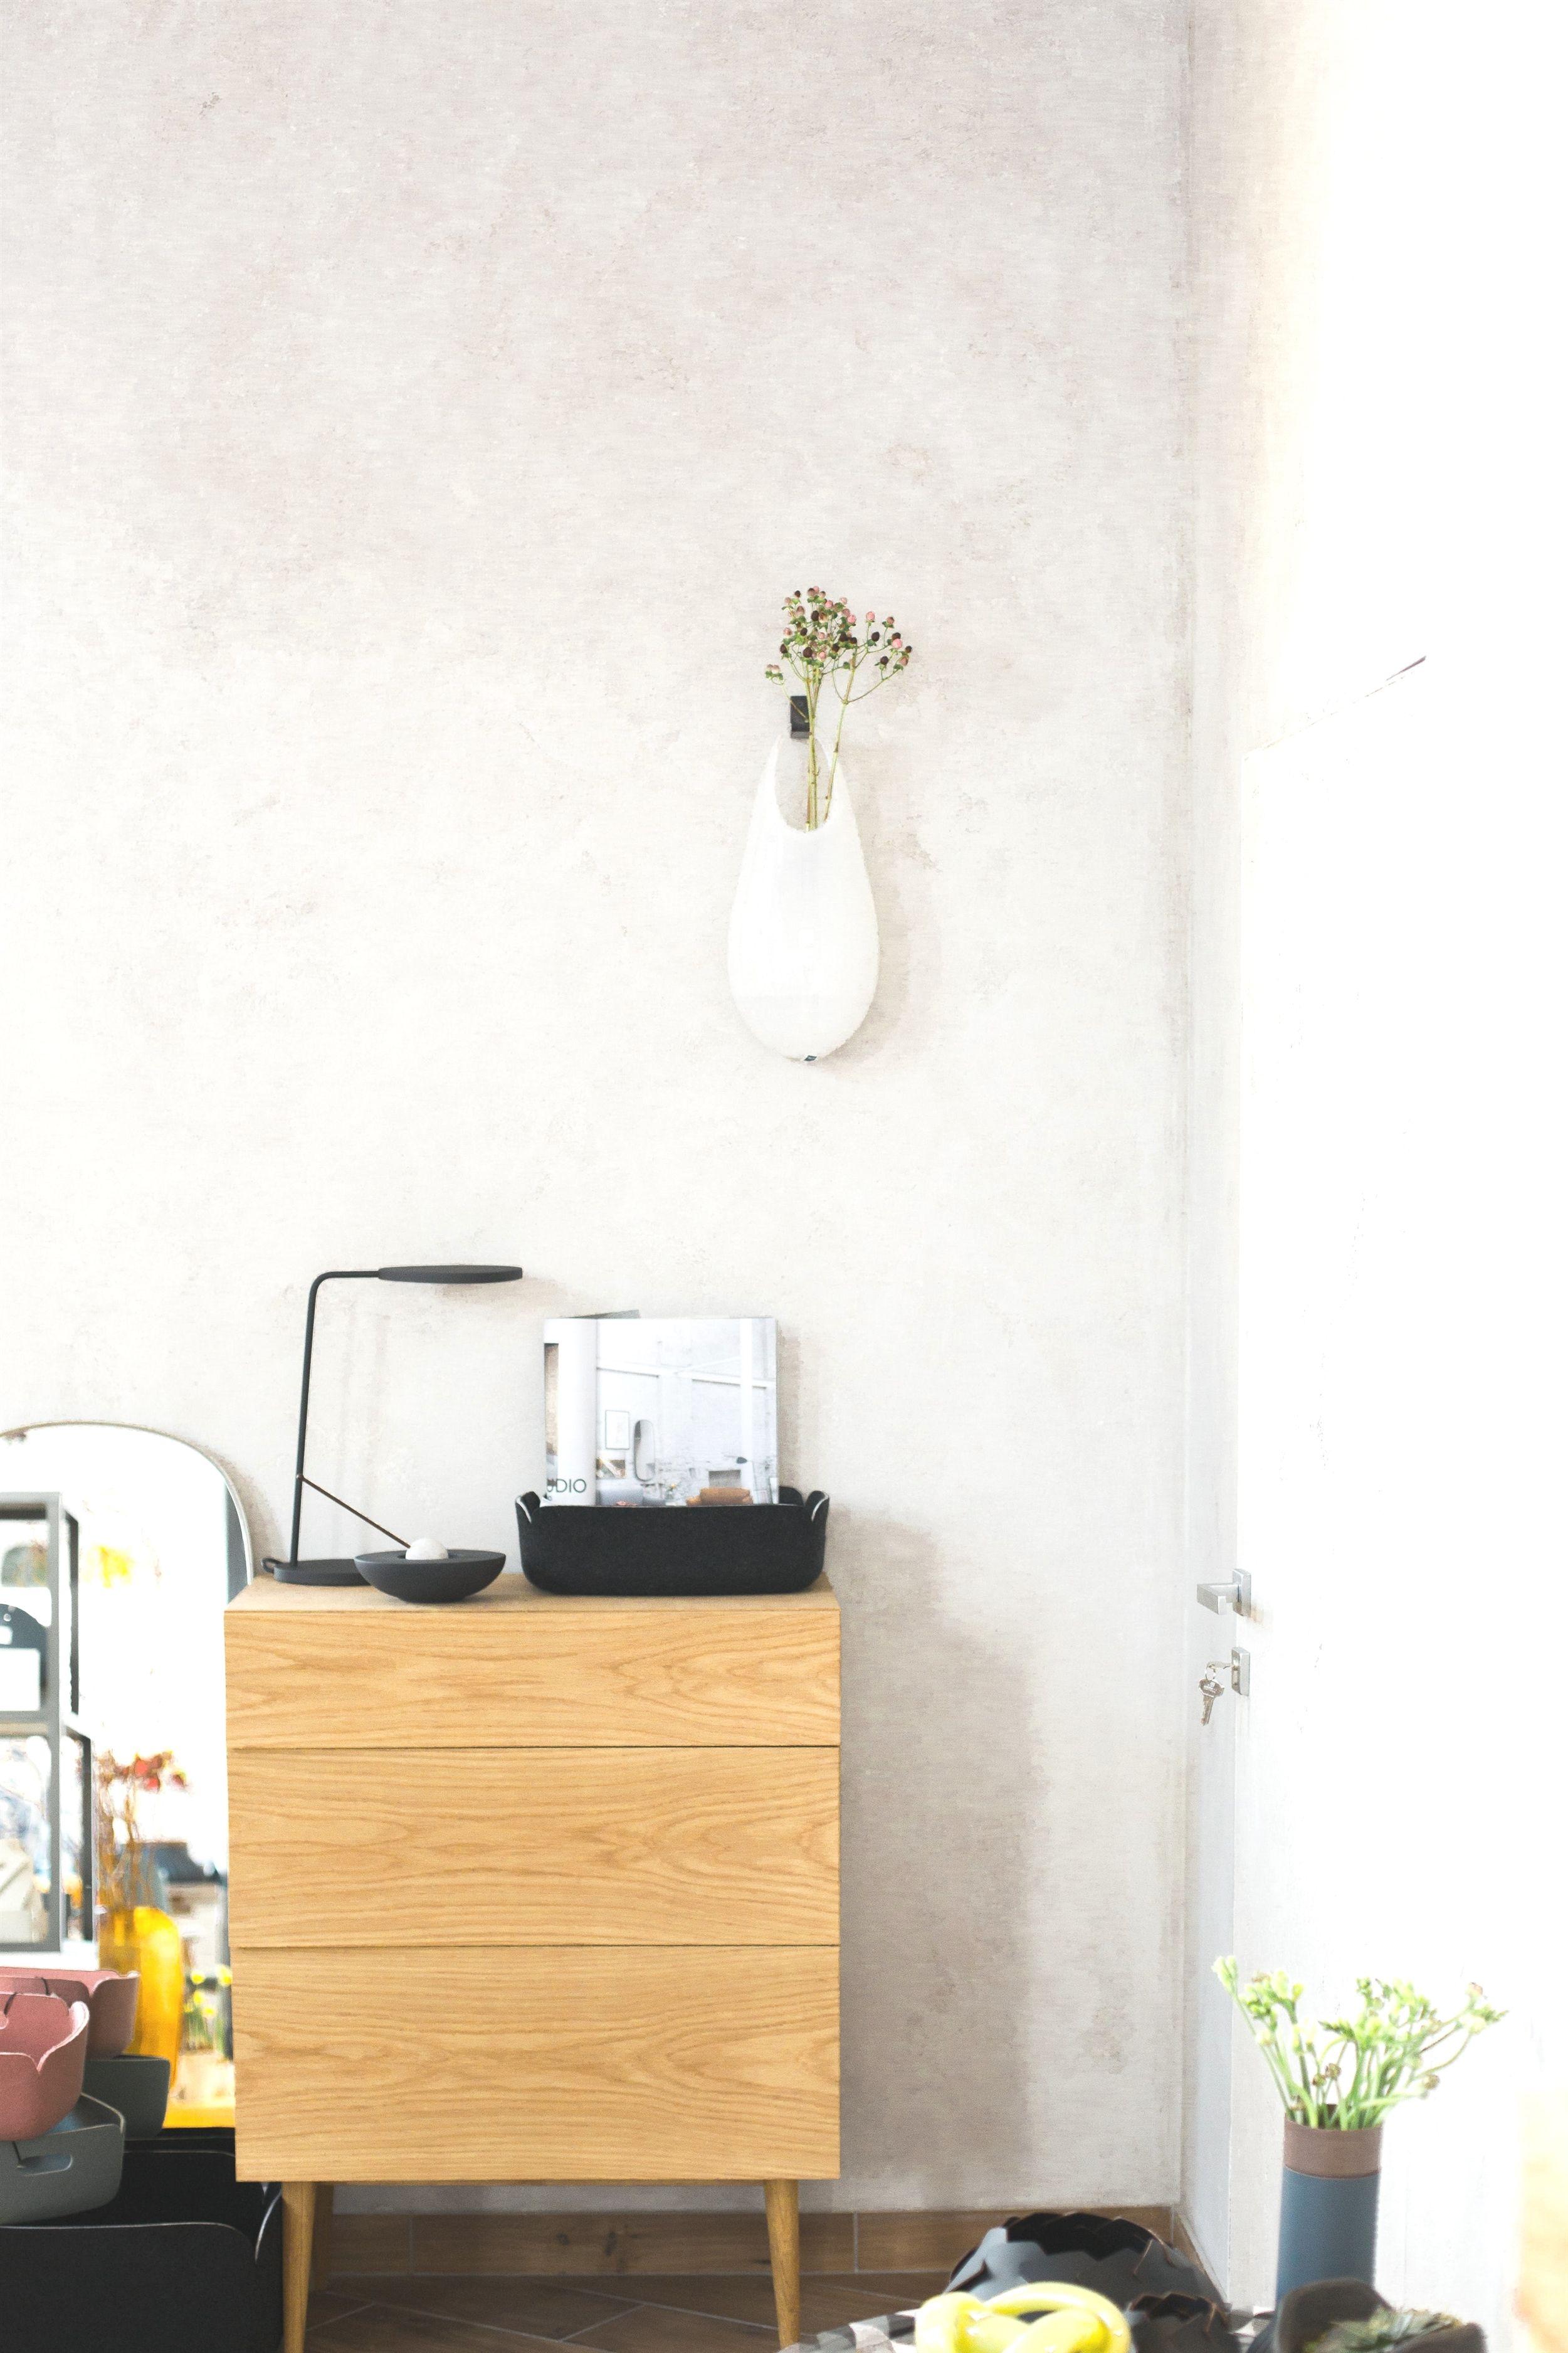 Home decor inspiration wall art christian diy room easy crafts ideas at january netflix also rh pinterest